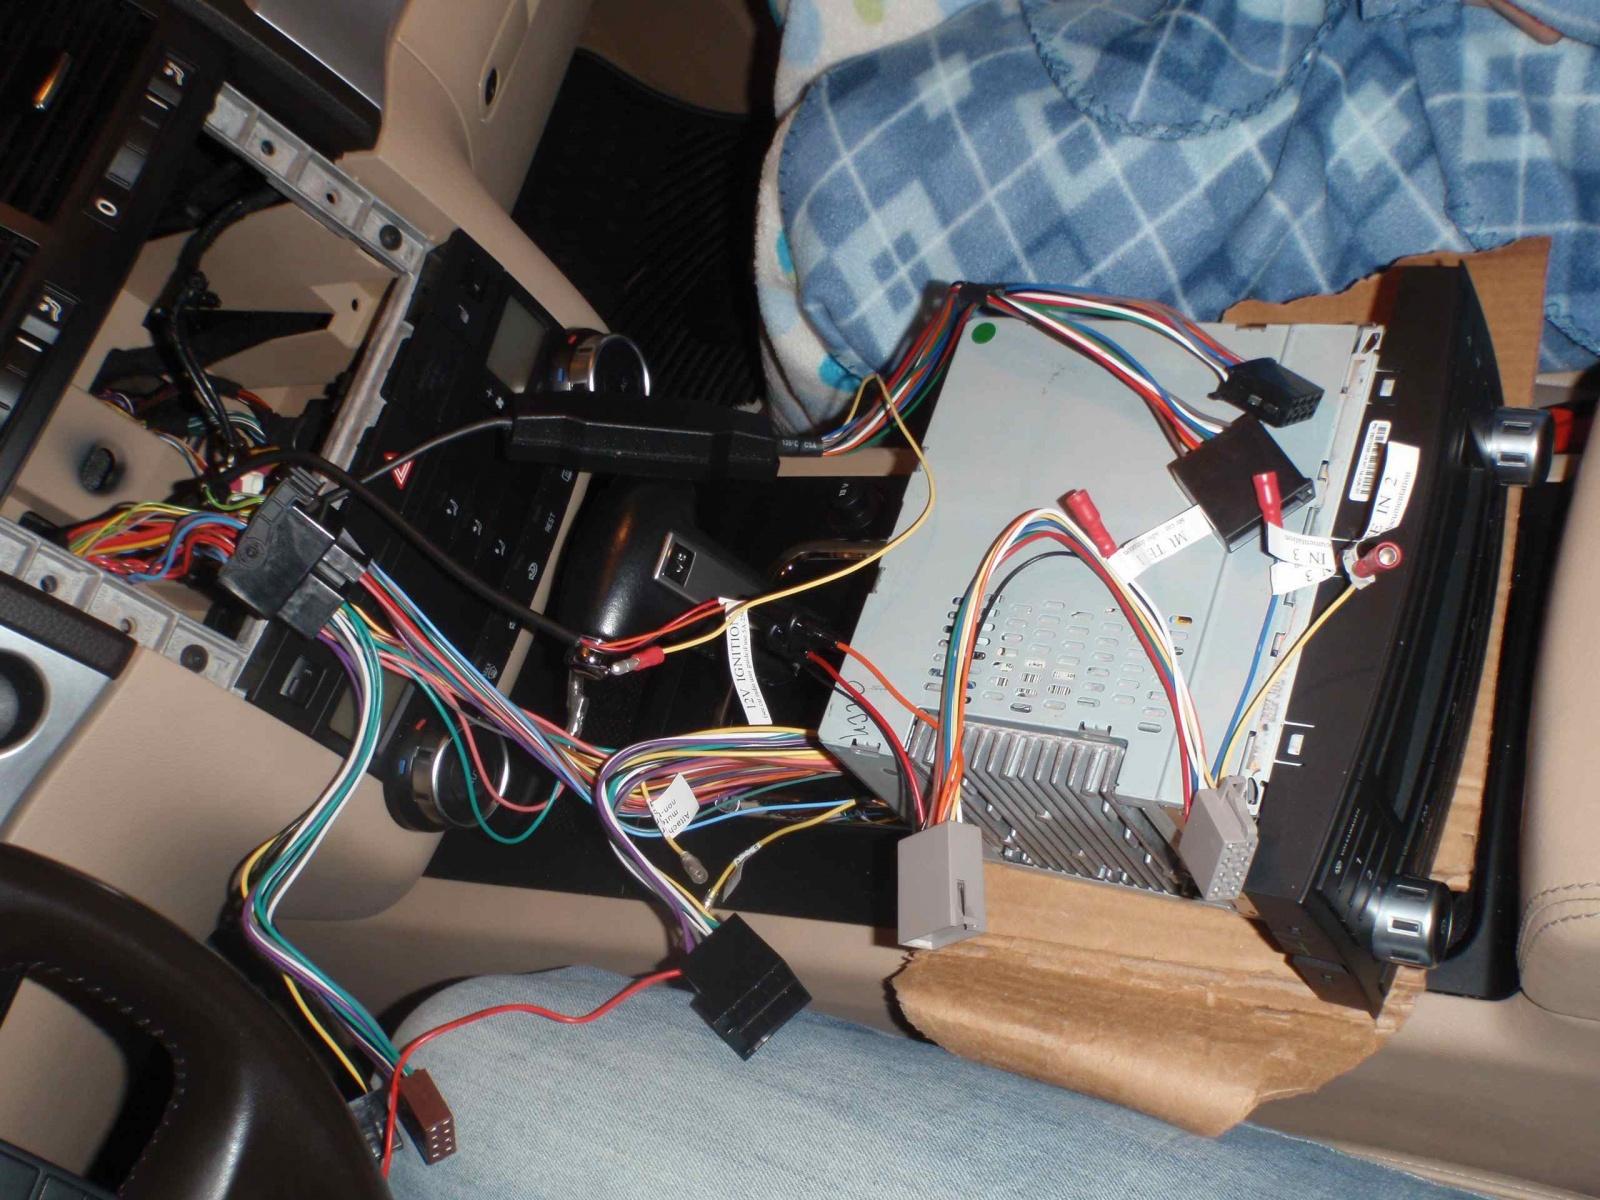 Parrot Bluetooth Wiring Experience Of Diagram Ck3100 Diy 2008 Touareg 2 Hands Free Ck3000 Headphones